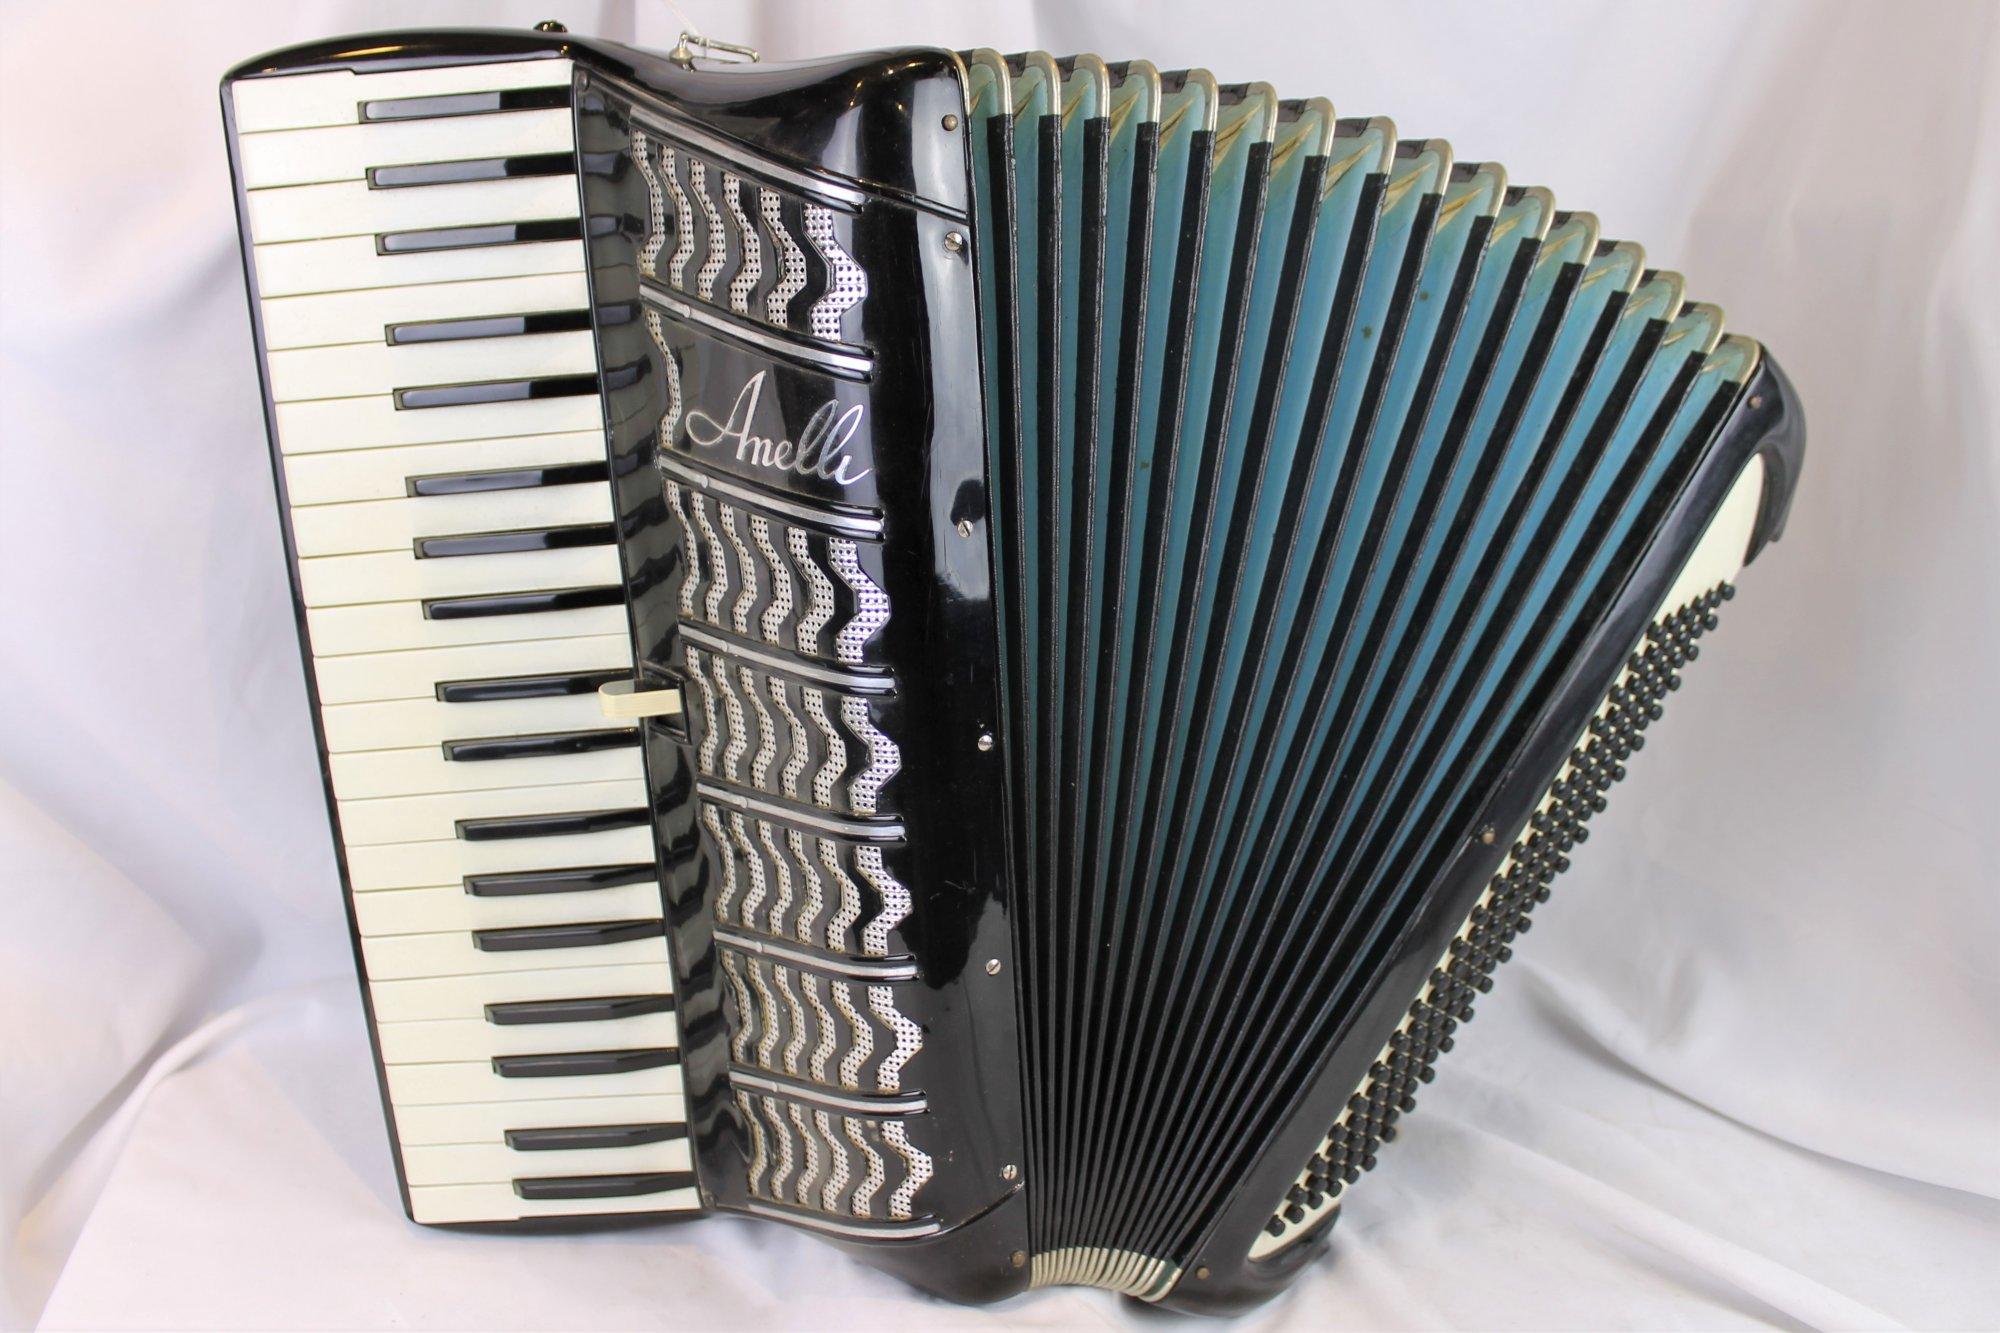 4396 - Black Amelli Piano Accordion LMM 41 120